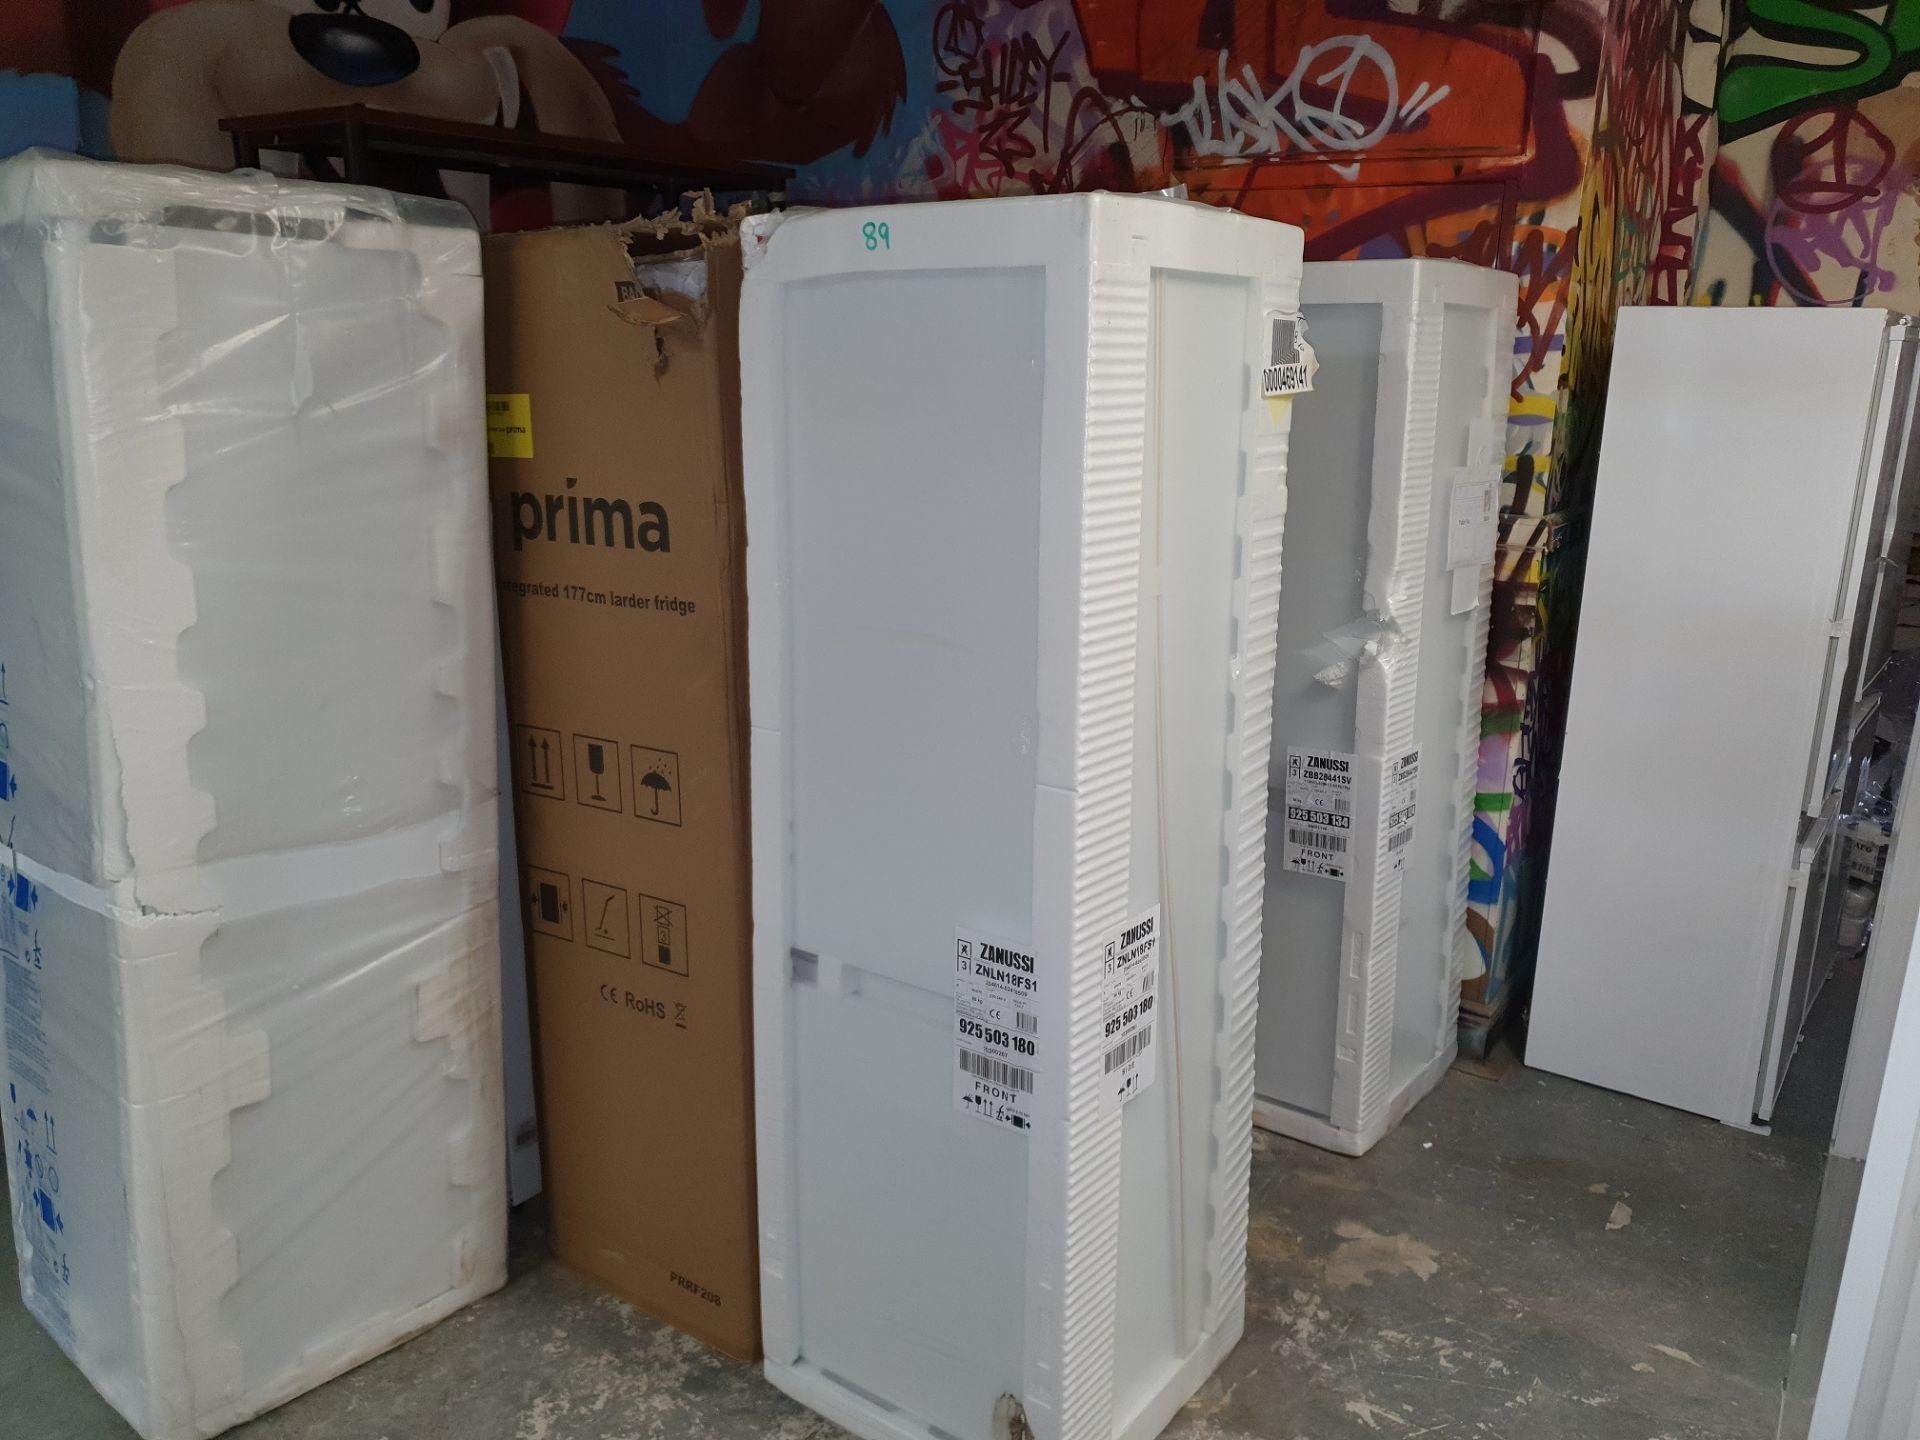 NEW/GRADED AND UNPACKAGED Beko BSCD150 Integrated 50/50 Fridge Freezer (Brand new slight external - Image 3 of 14